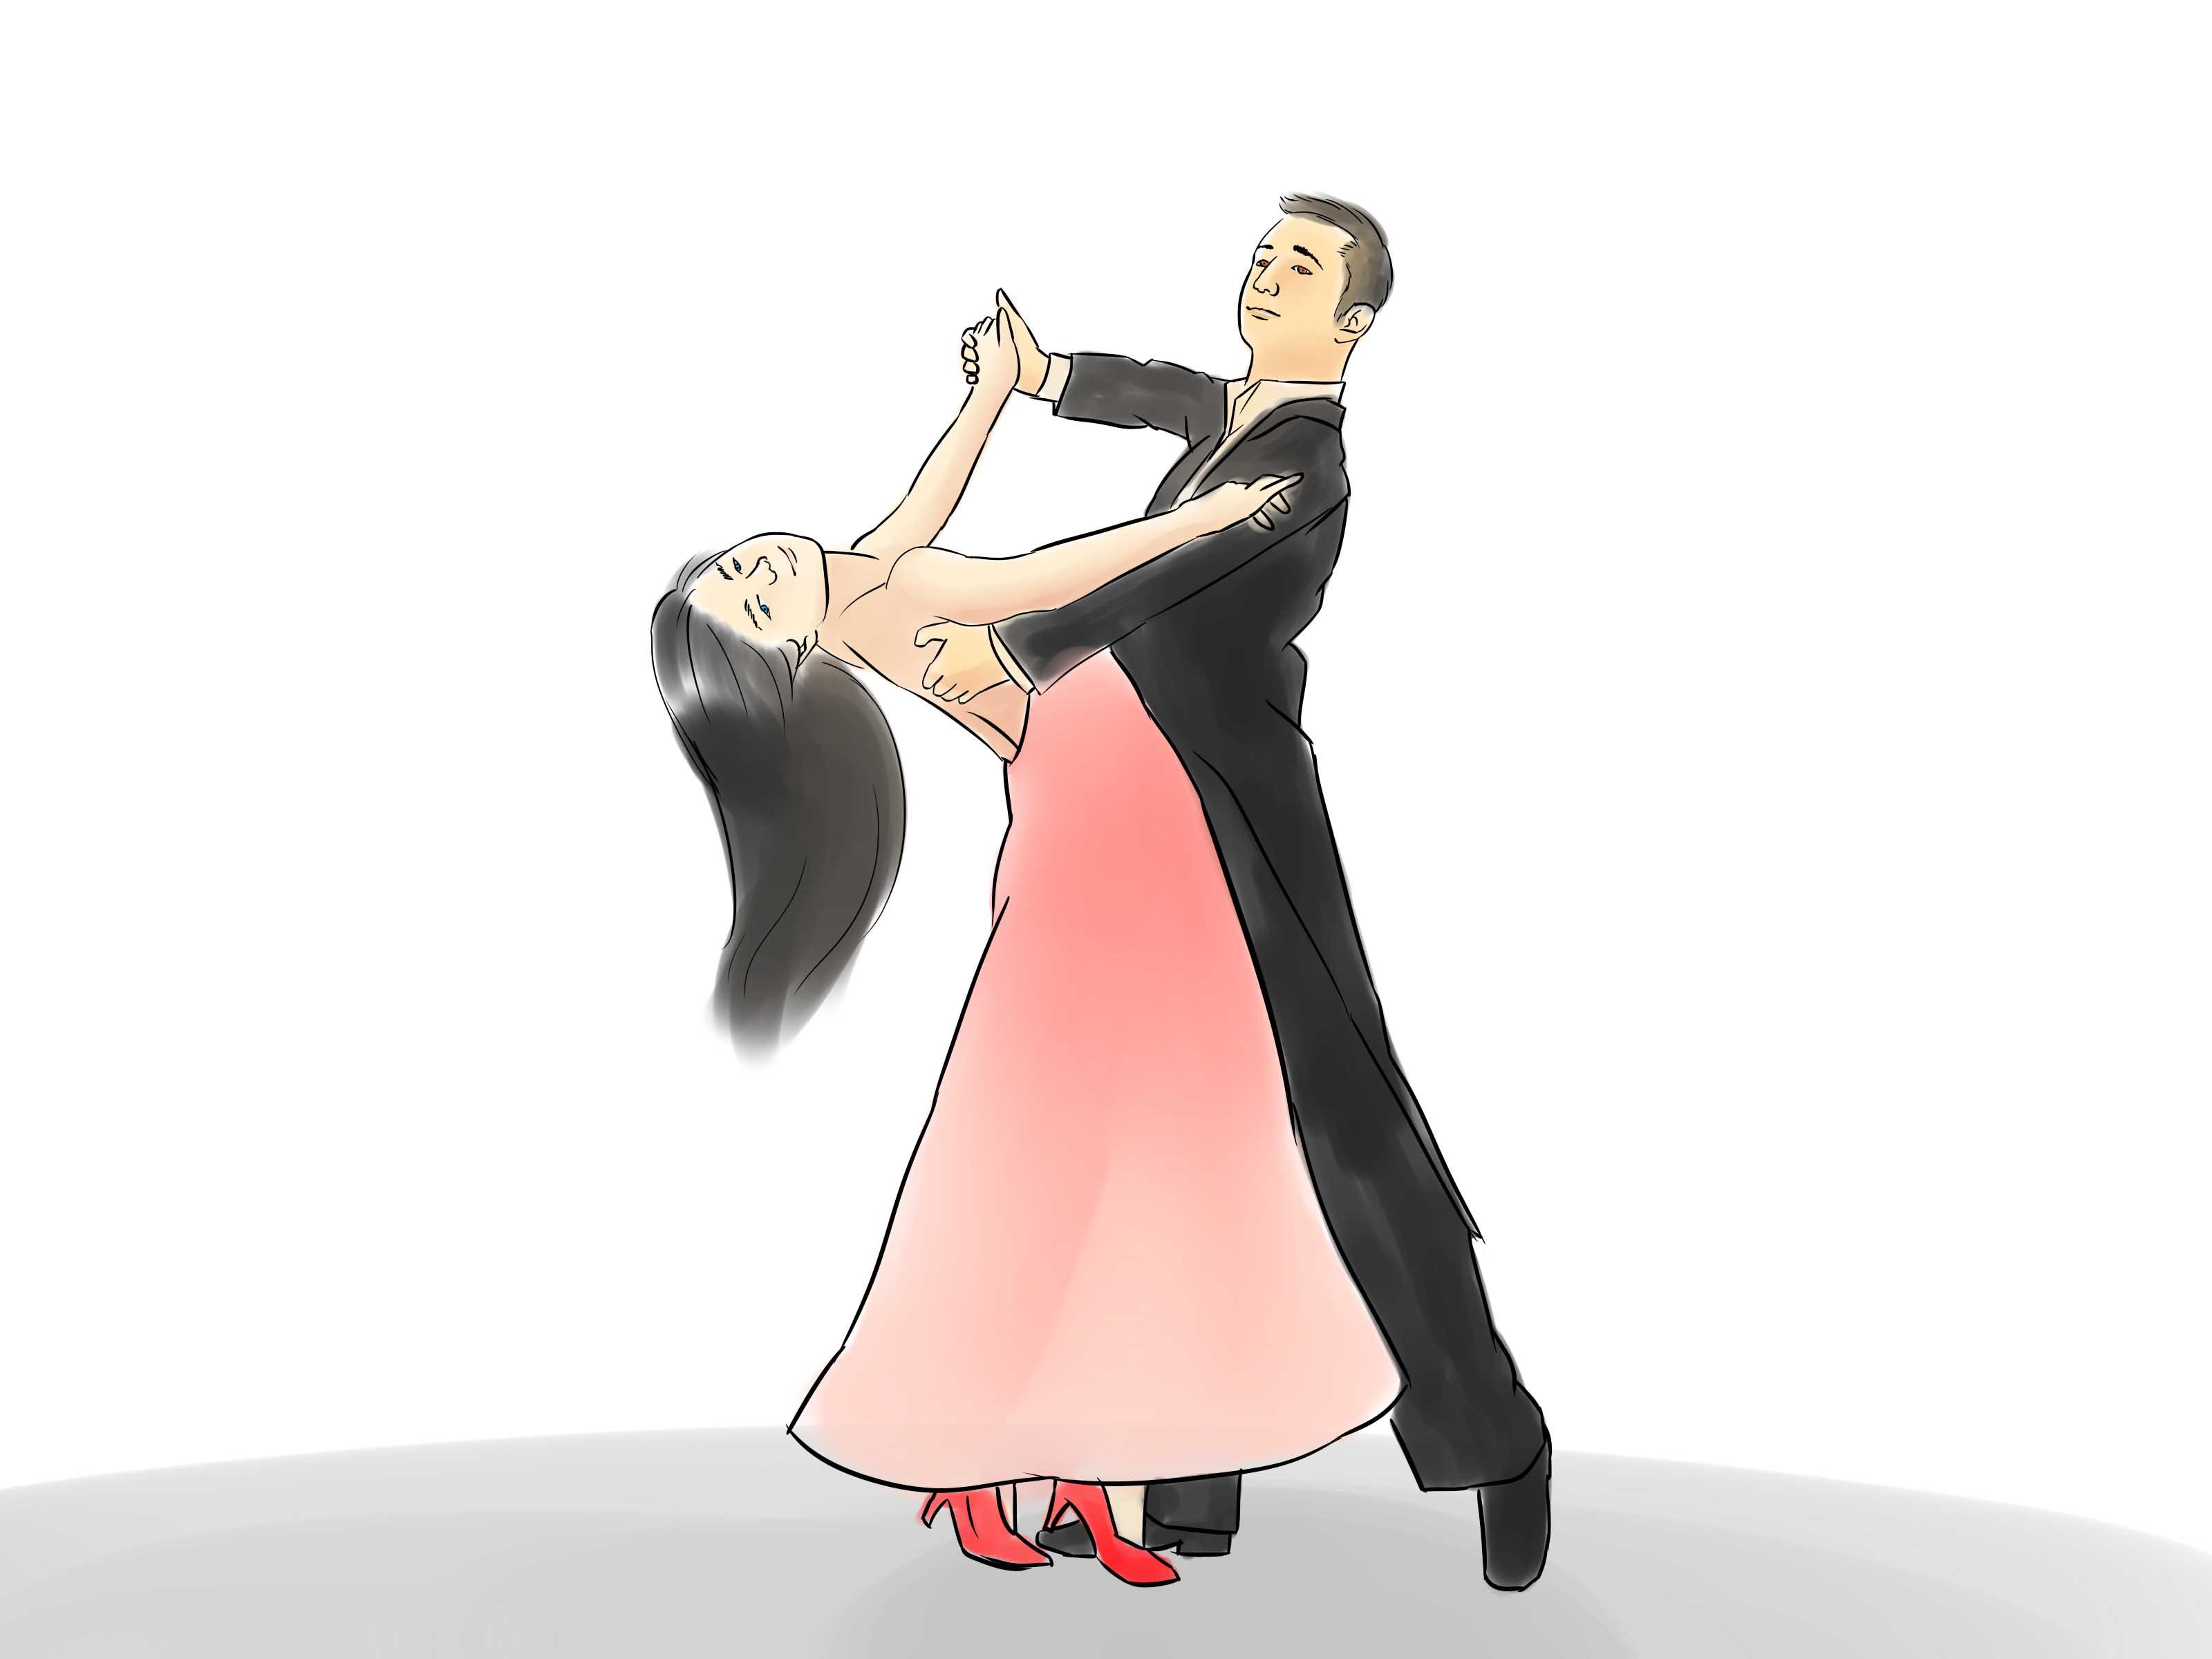 Images of Ballroom Dancing | 3200x2400